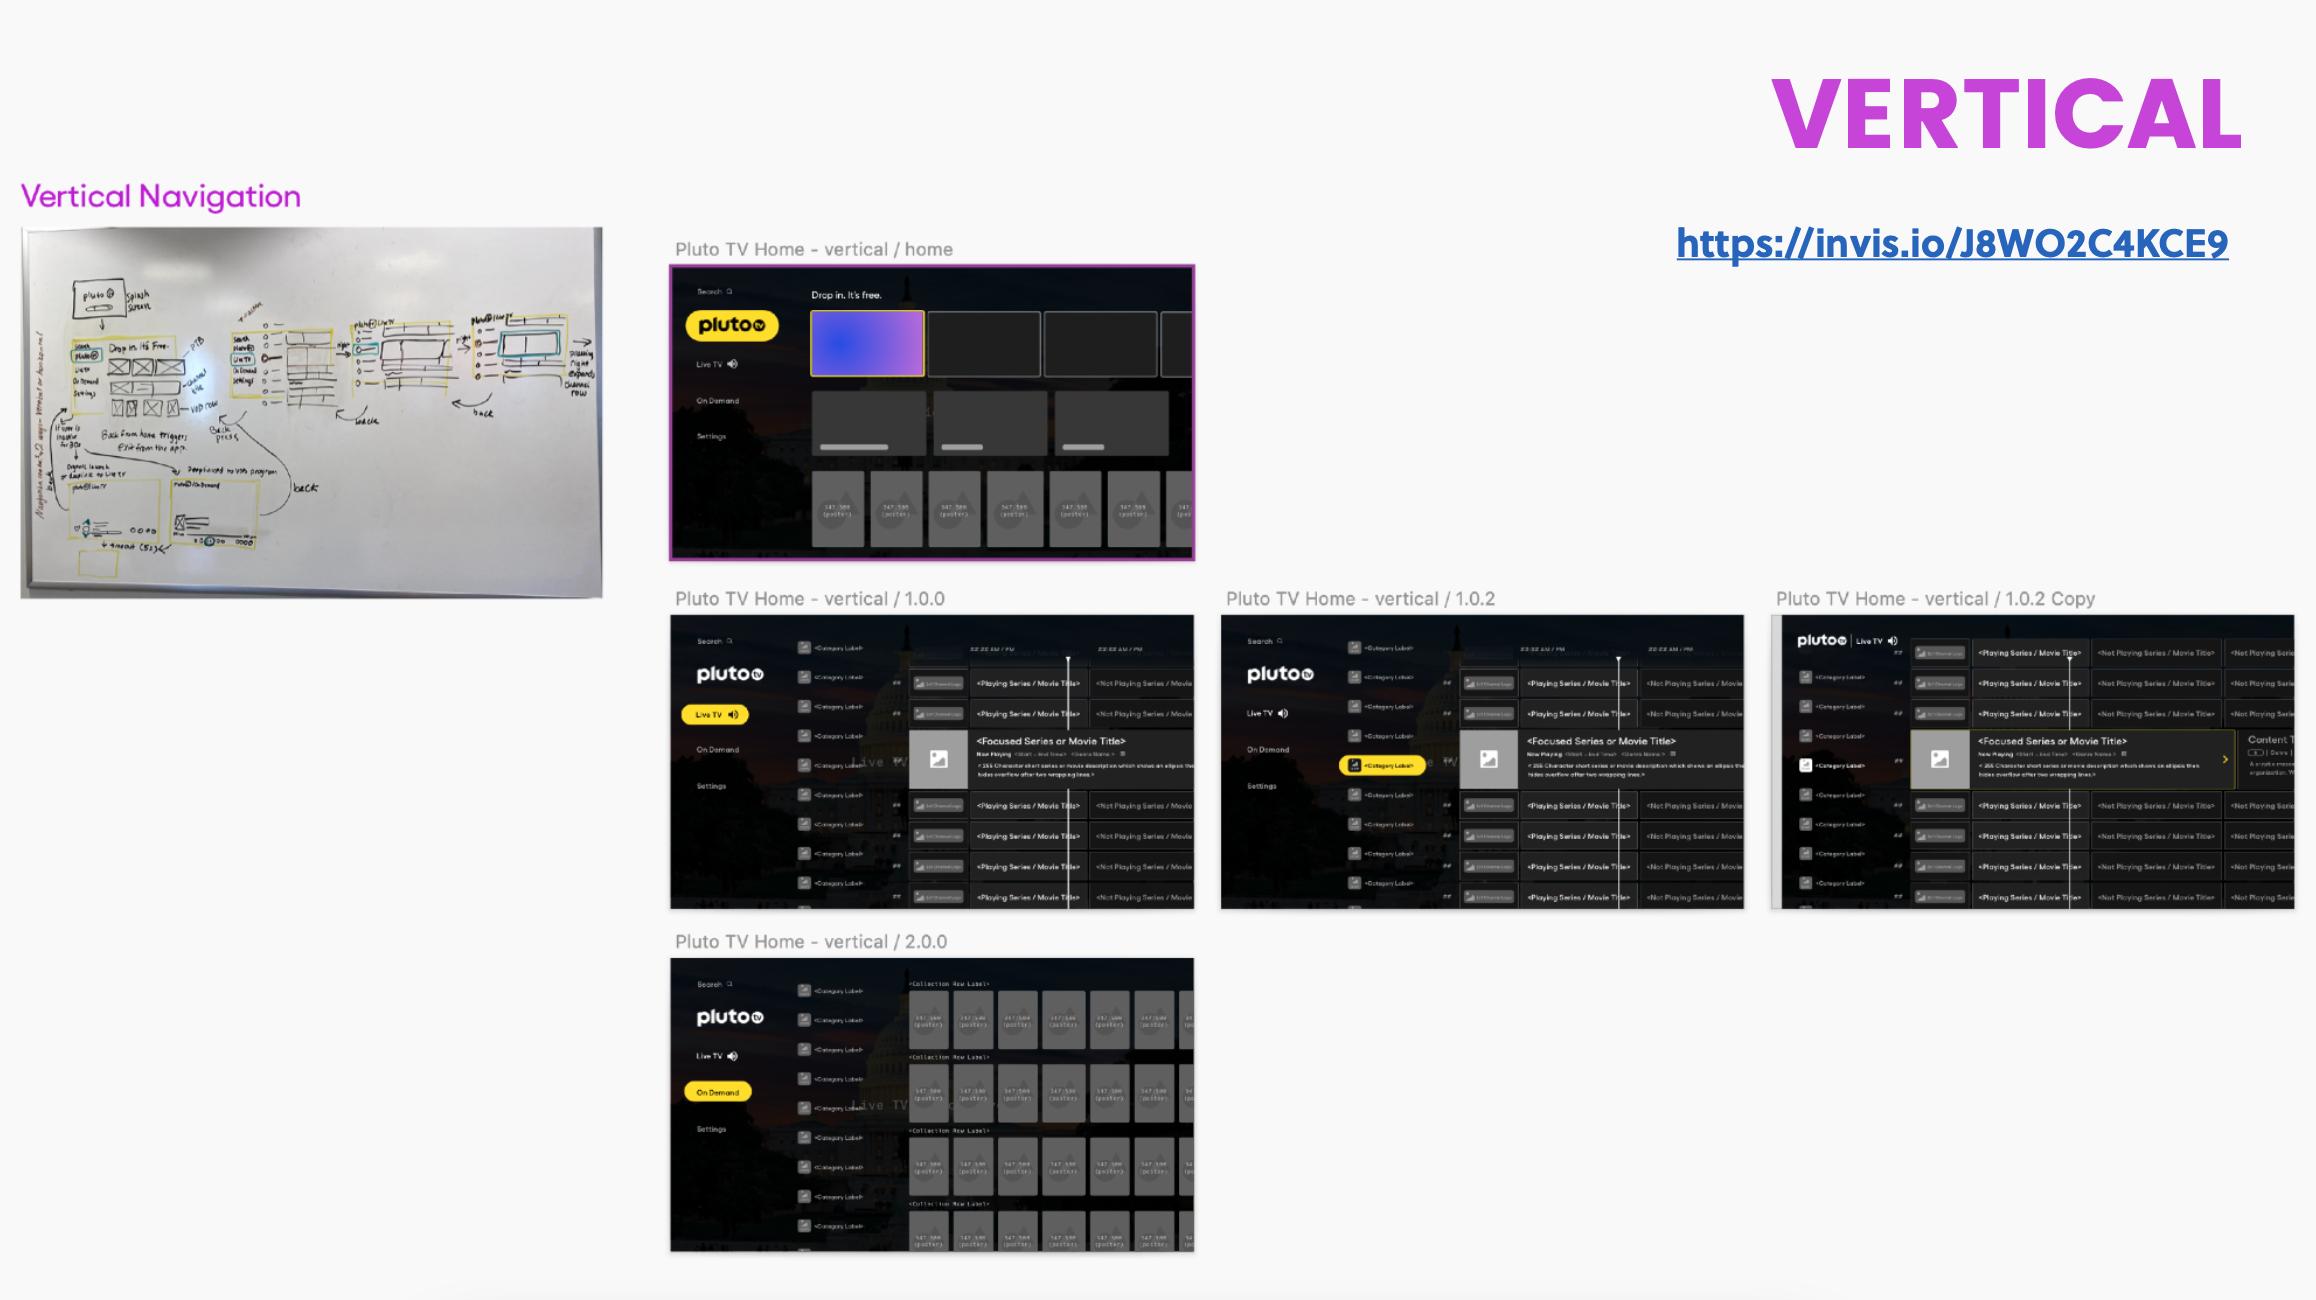 White frames of the vertical user flow.